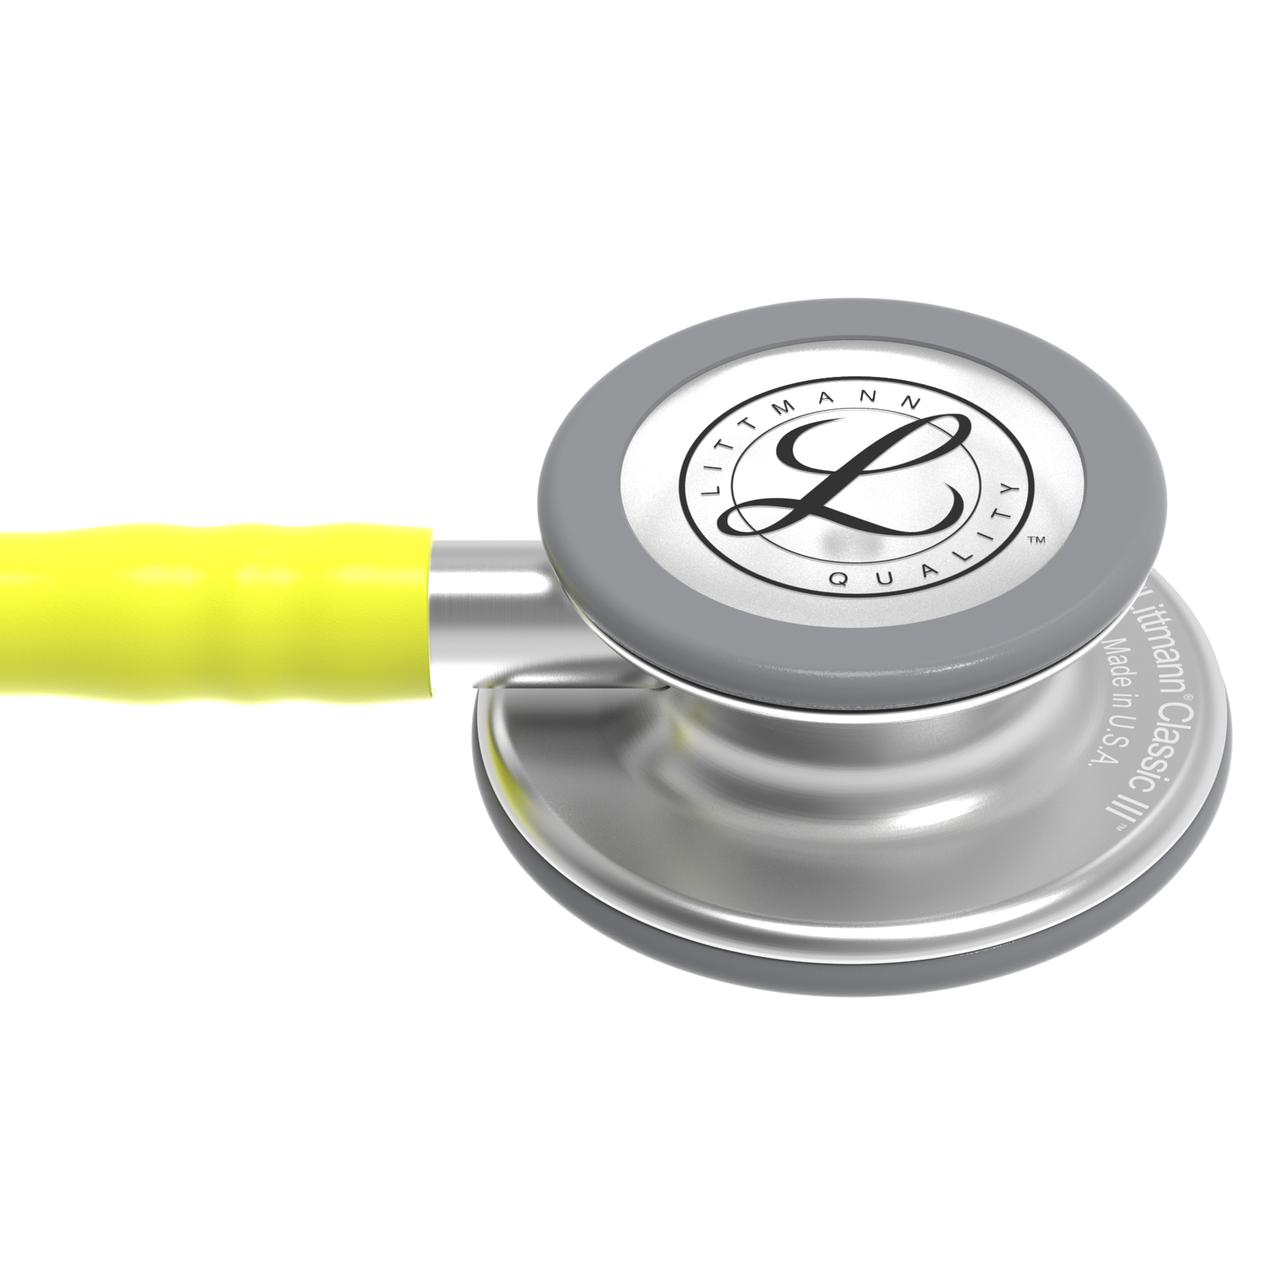 Littmann Classic III Stethoscope, Lemon-Lime, 5839